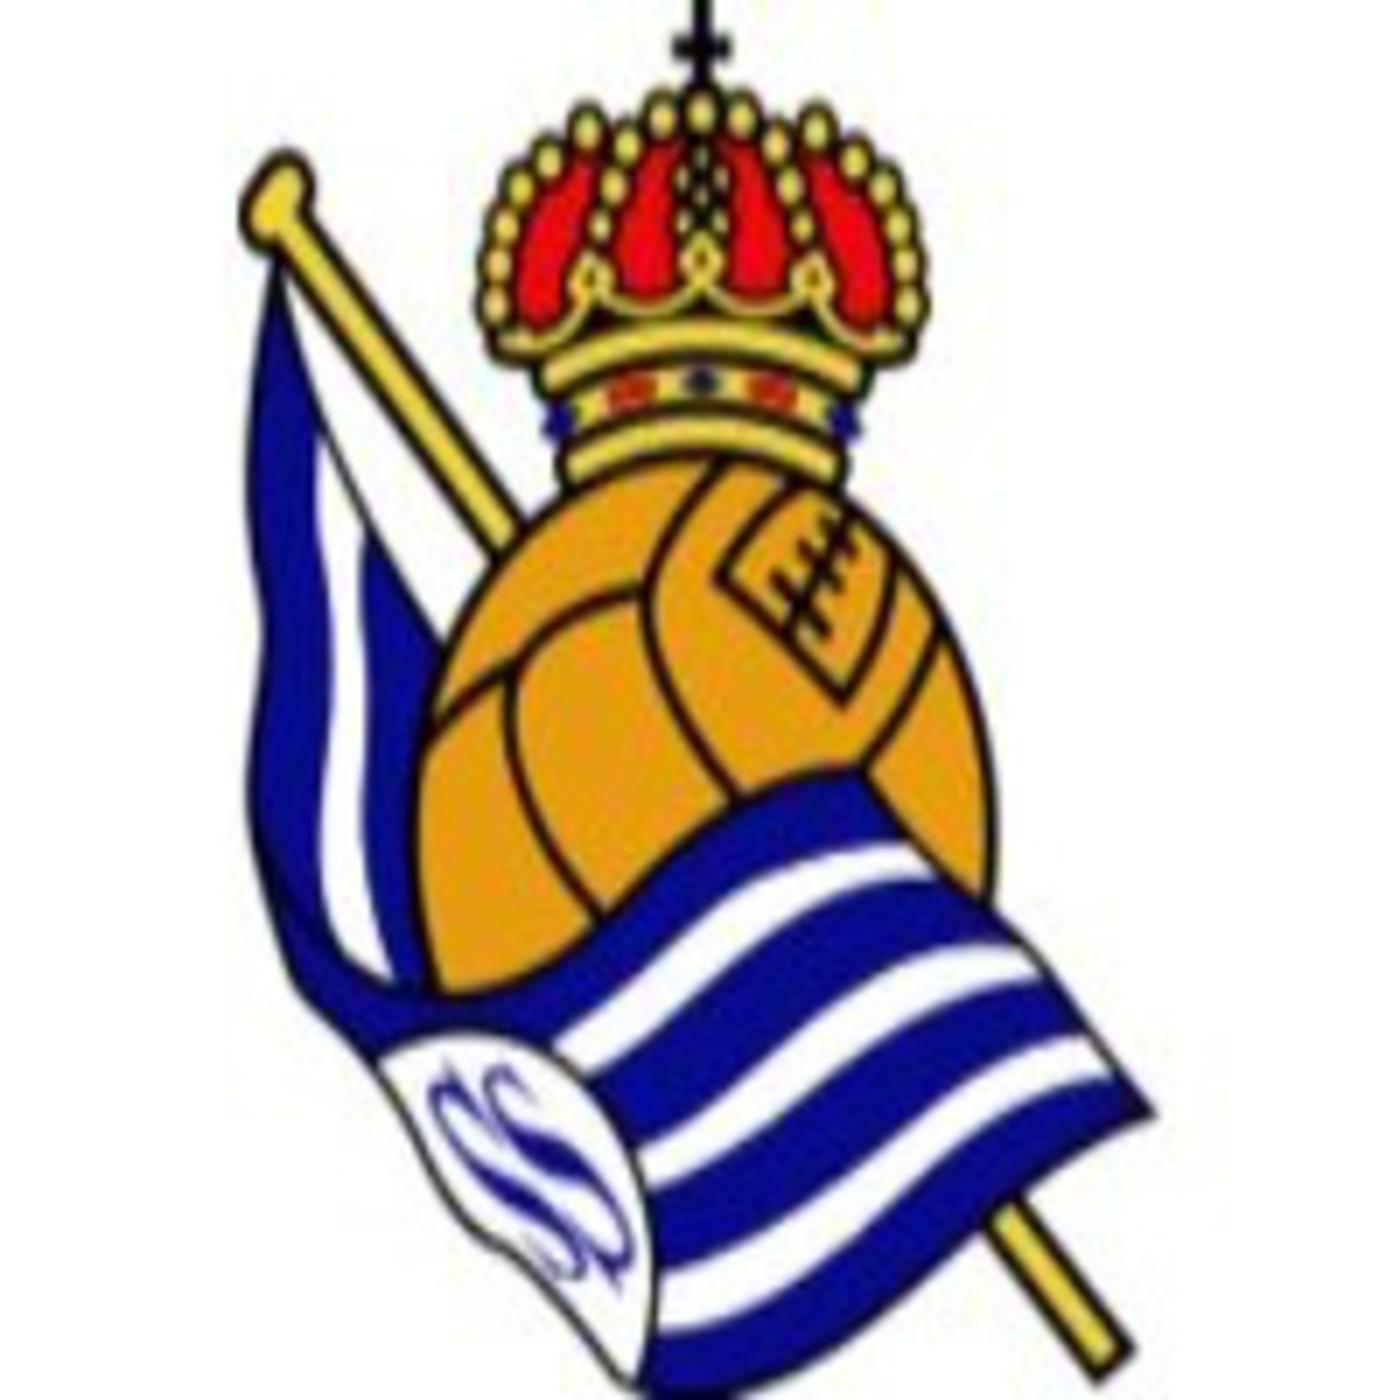 Tertulia Real Sociedad 31-03-2014 Herri Irratia